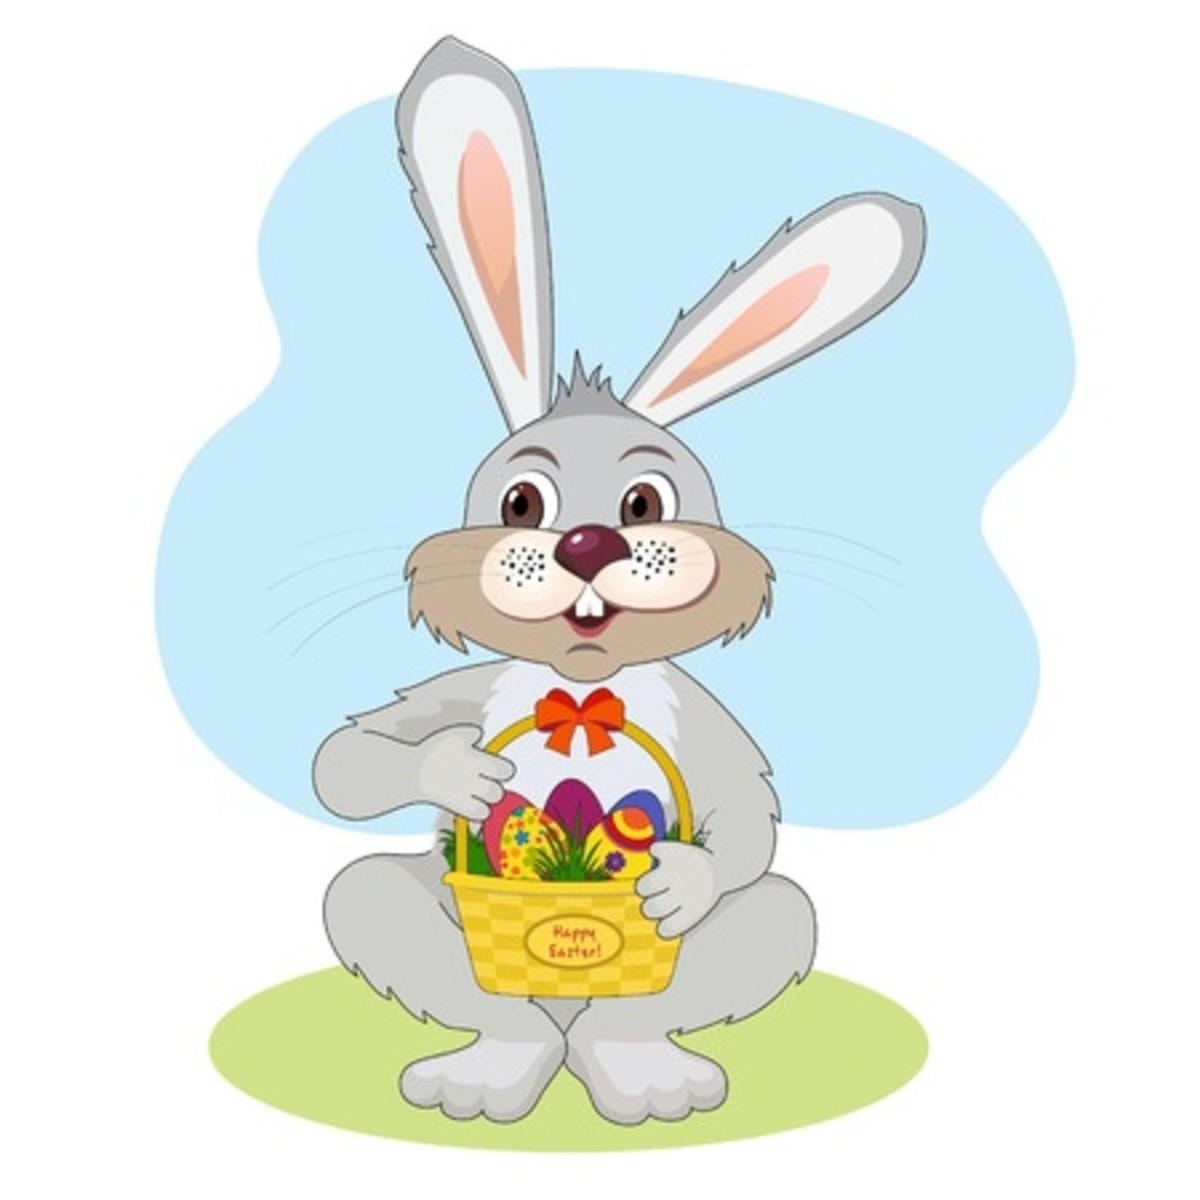 An eggs-ellent Easter gift